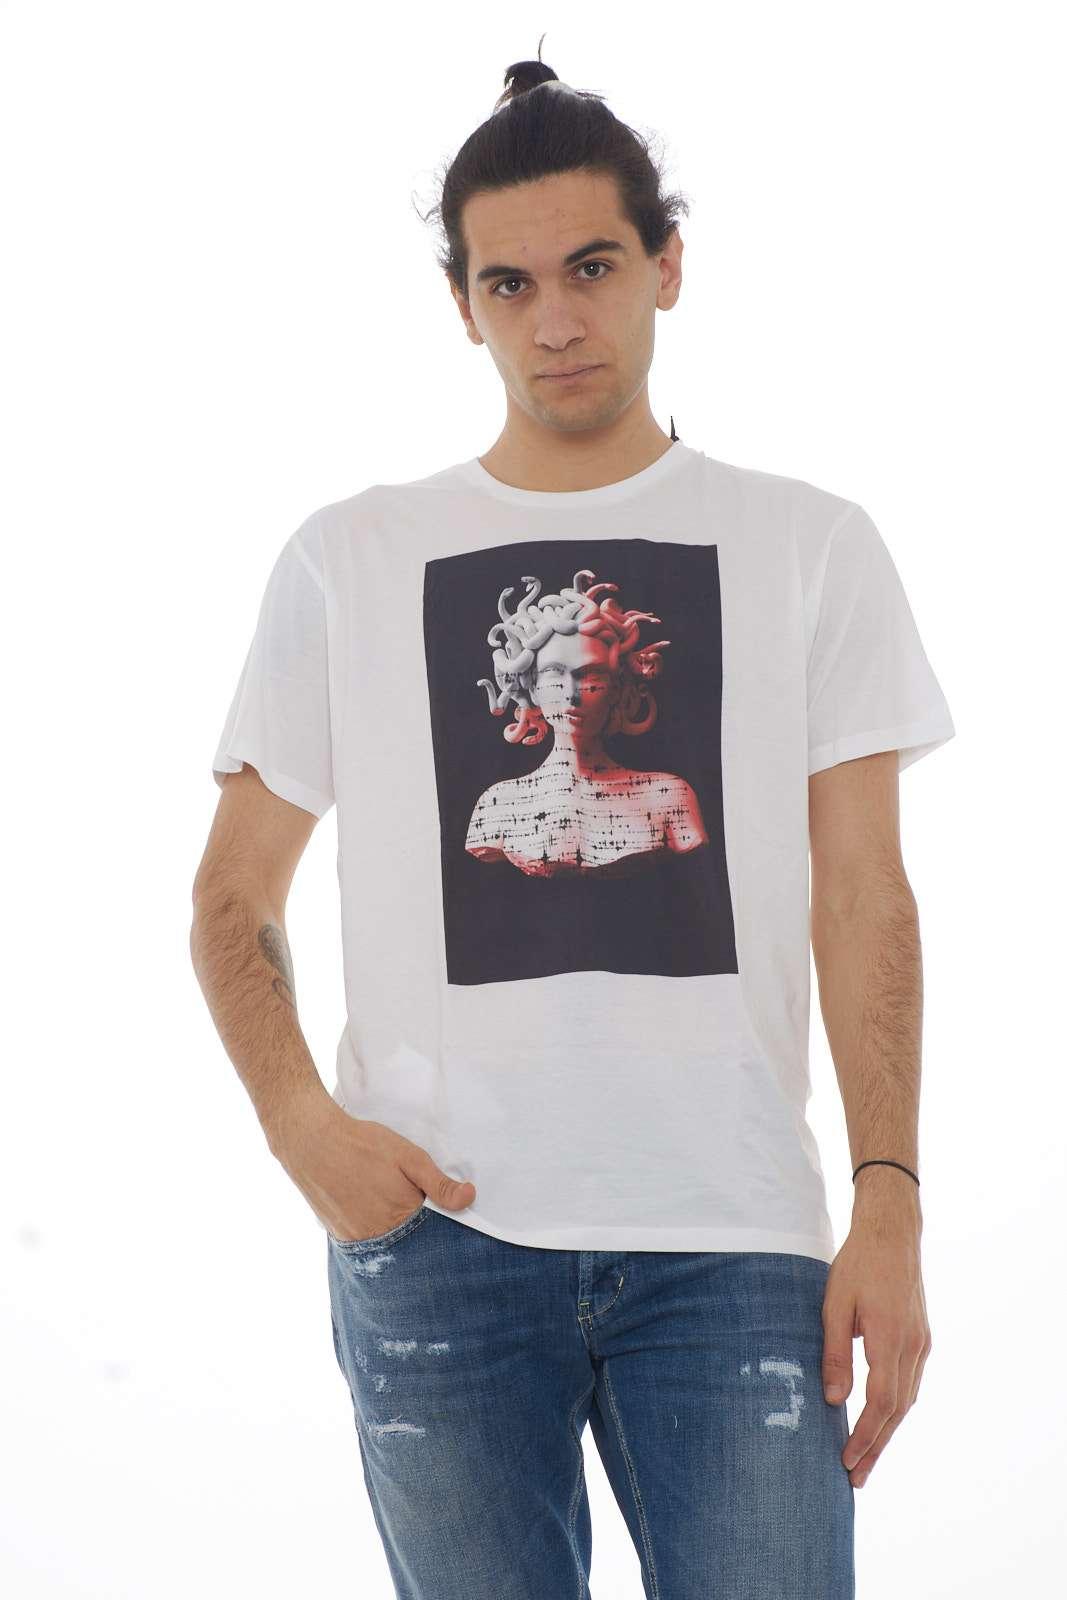 https://www.parmax.com/media/catalog/product/a/i/PE_outlet_parmax-t-shirt-uomo-Bomboogie-TM5602-A.jpg